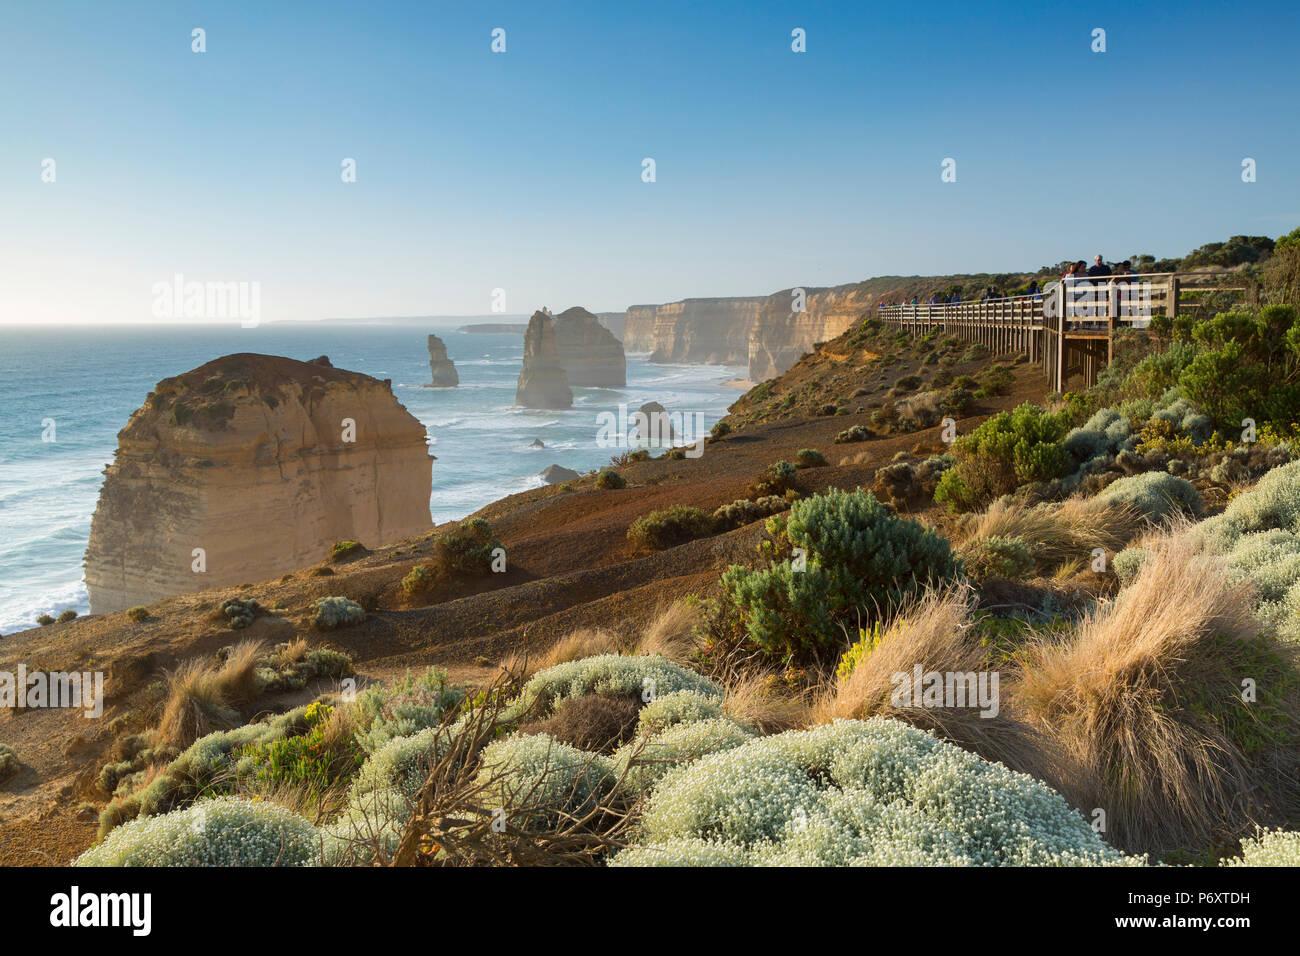 Twelve Apostles, Port Campbell National Park, Great Ocean Road, Victoria, Australia - Stock Image